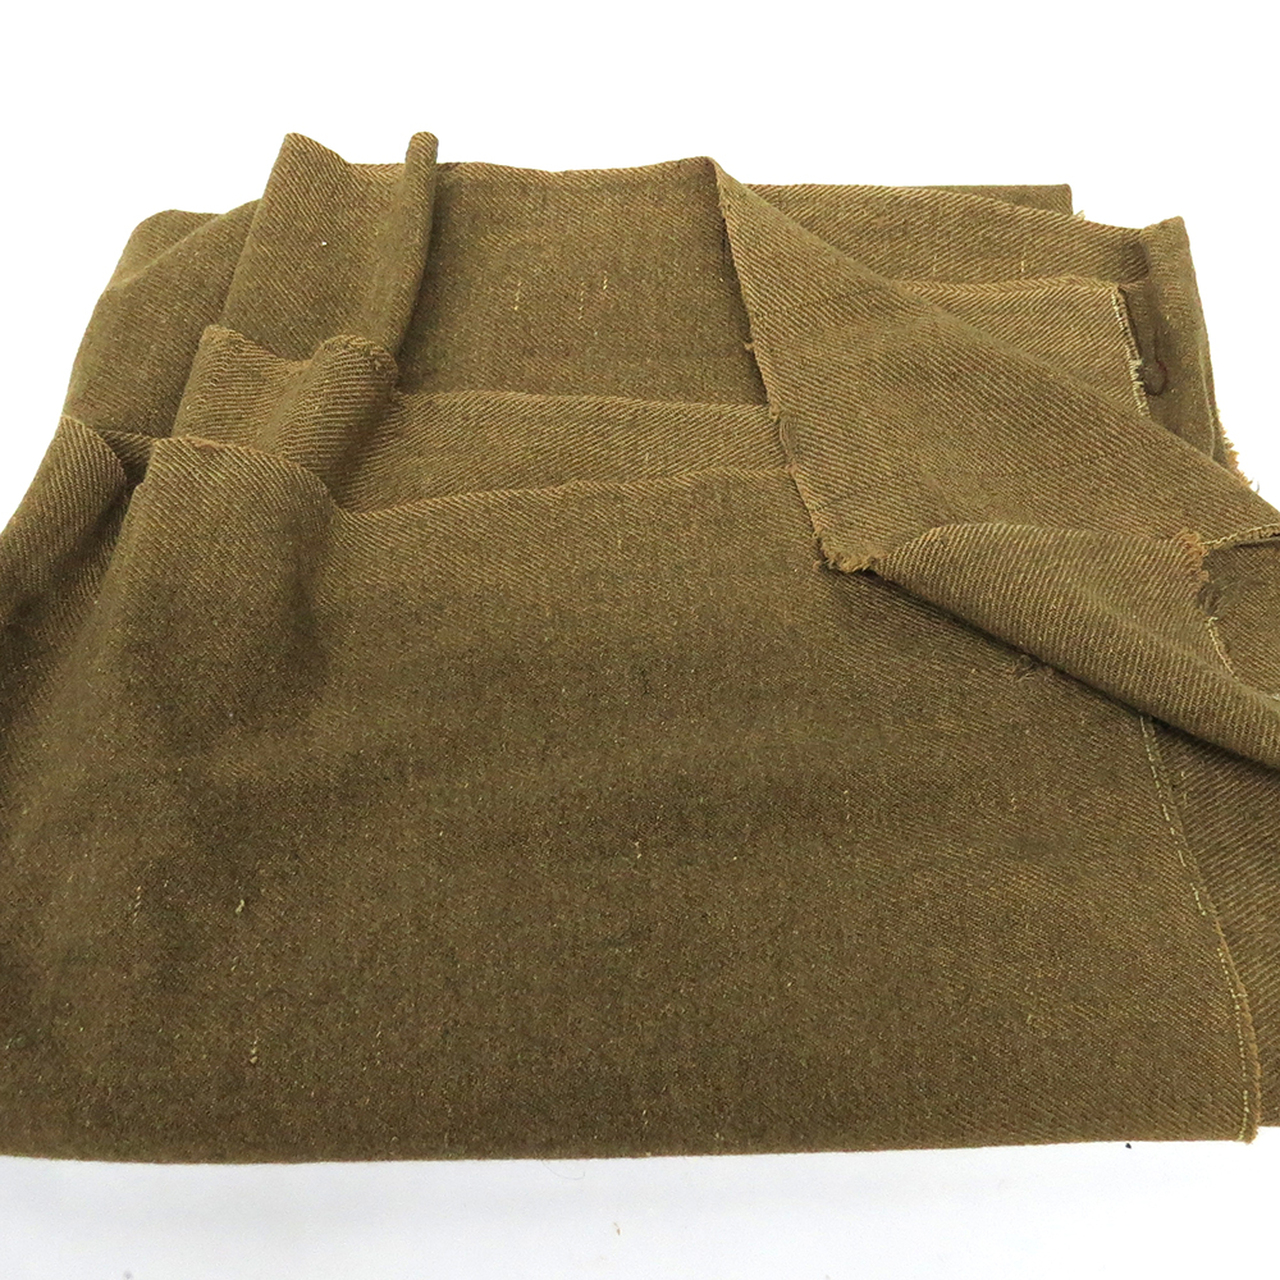 Doughboy Blanket